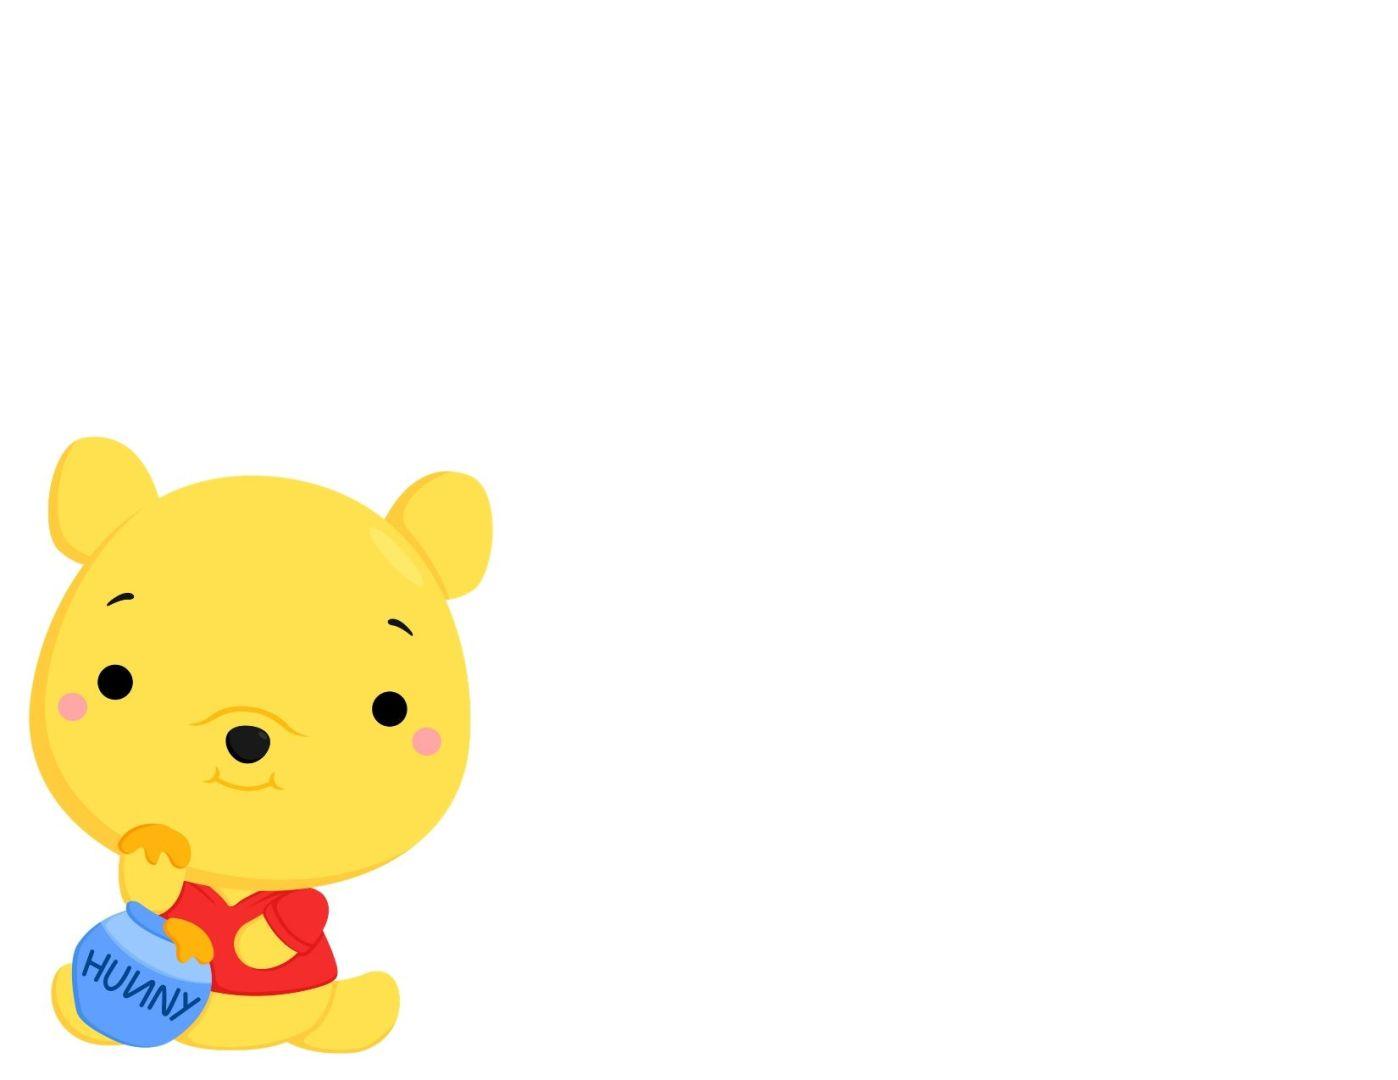 Winnie the Pooh autograph page | AlwaysMovingMommy.com